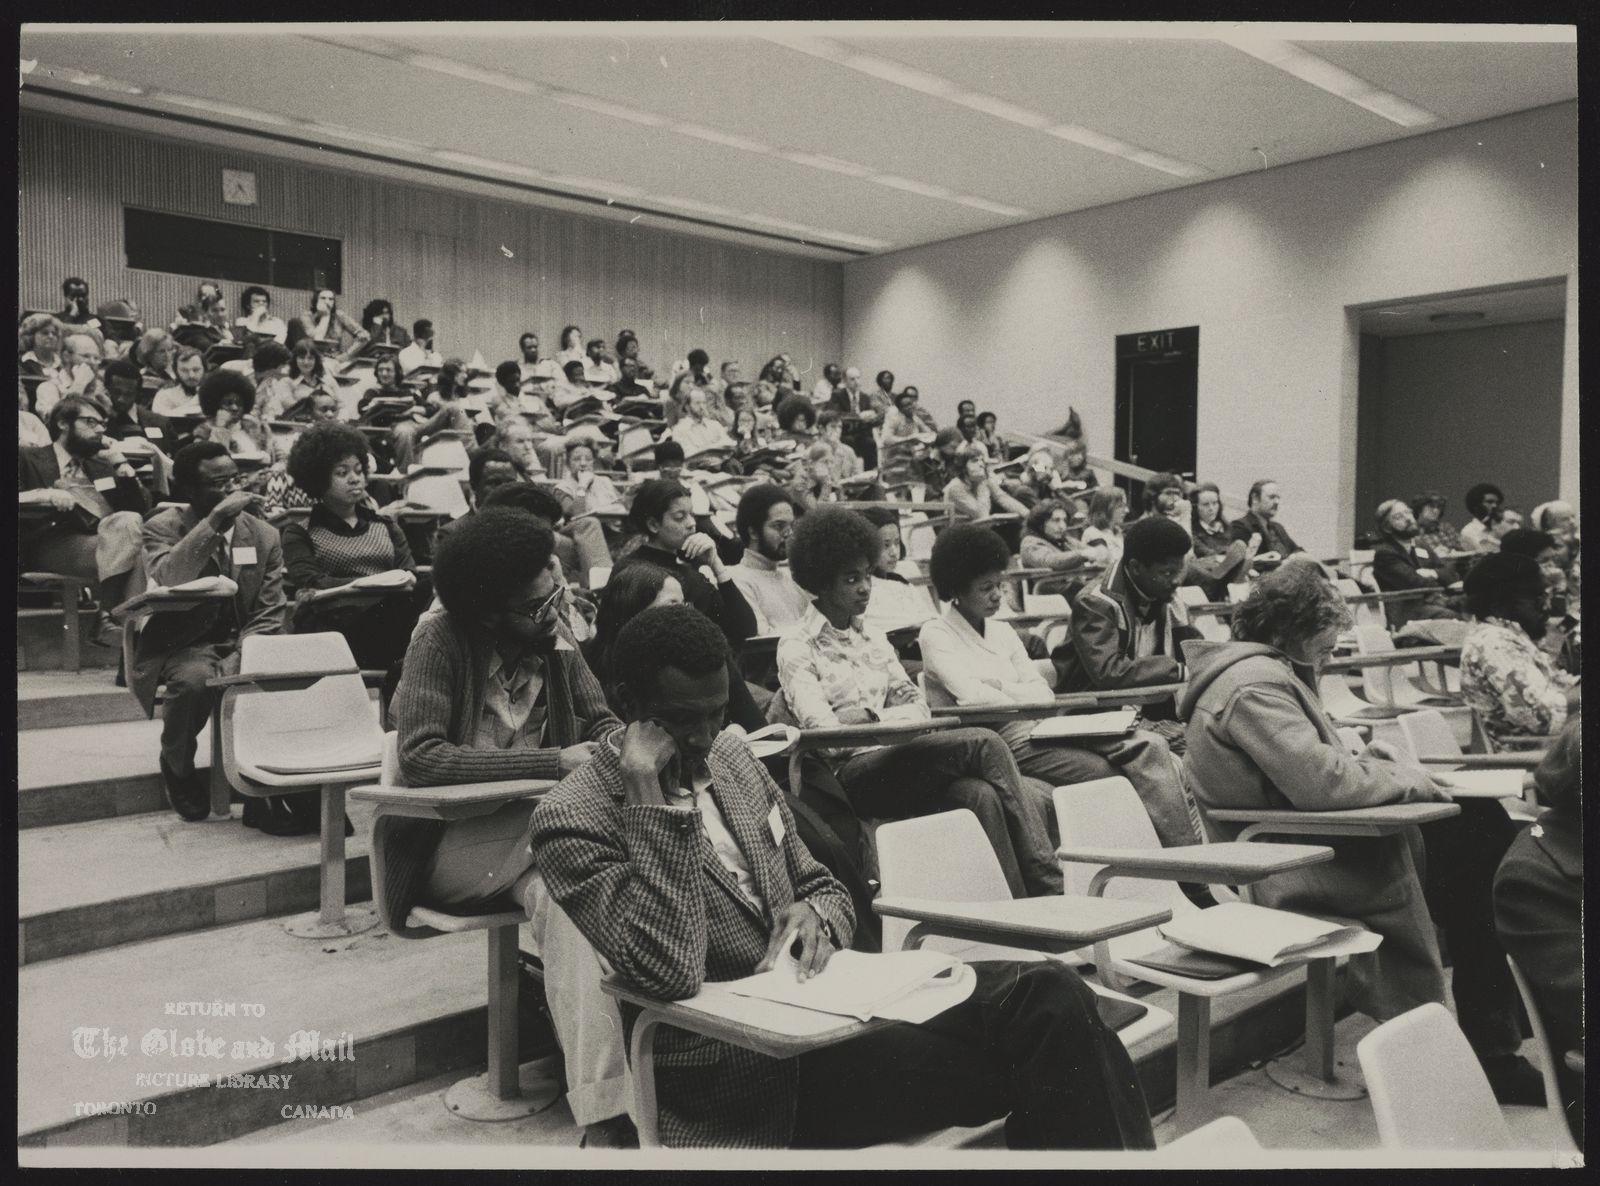 BLACKS IN CANADA The Black Experience, a seminar at York University, February 20, 1975.